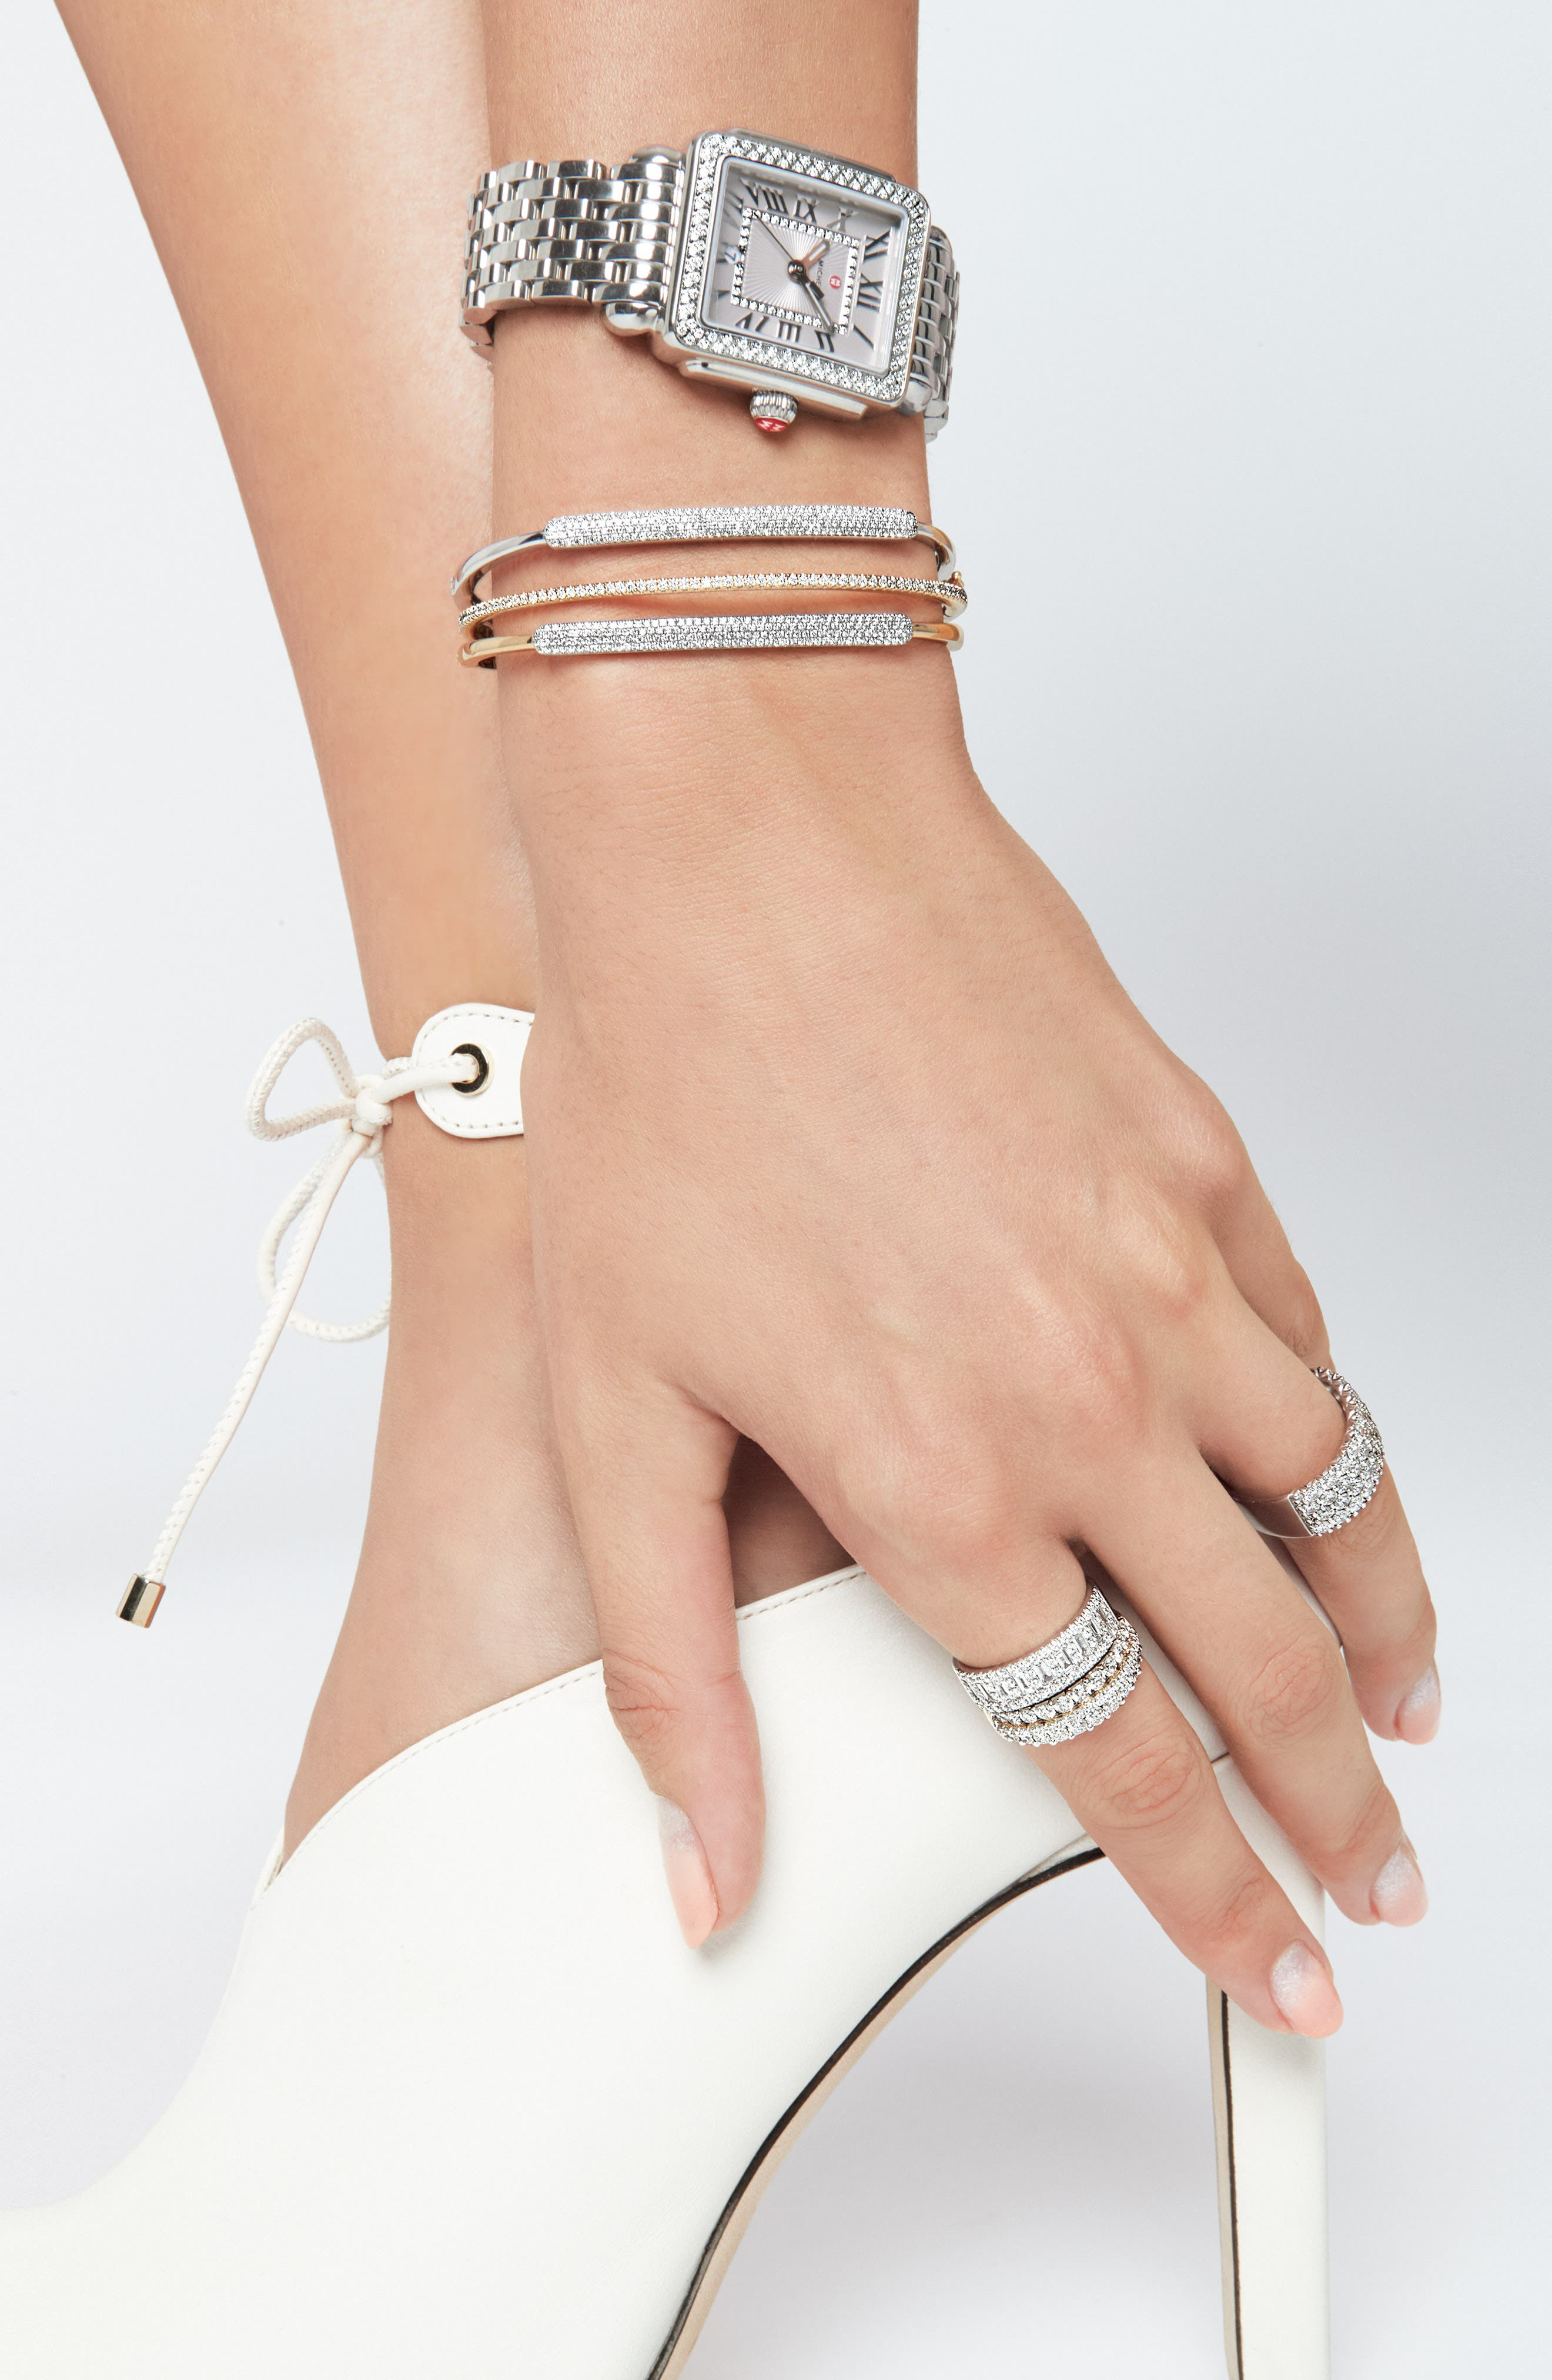 Deco 16 16mm Bracelet Watchband,                             Alternate thumbnail 11, color,                             SILVER